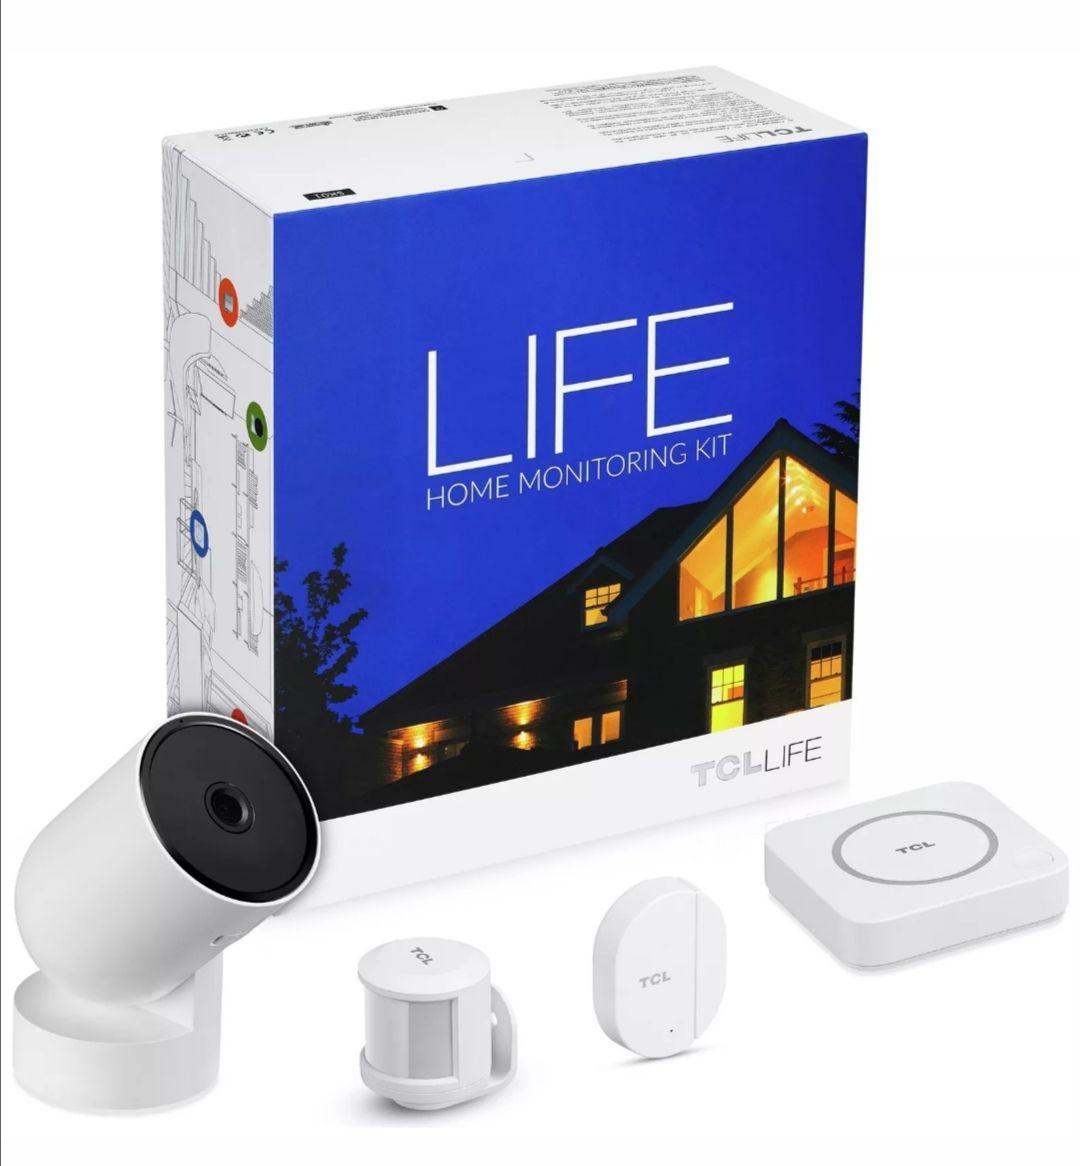 TCL LIFE Home Monitoring Kit (Home Bridge, IP Camera, Door Sensor, Motion Sensor) £29.99 @ Argos / Ebay